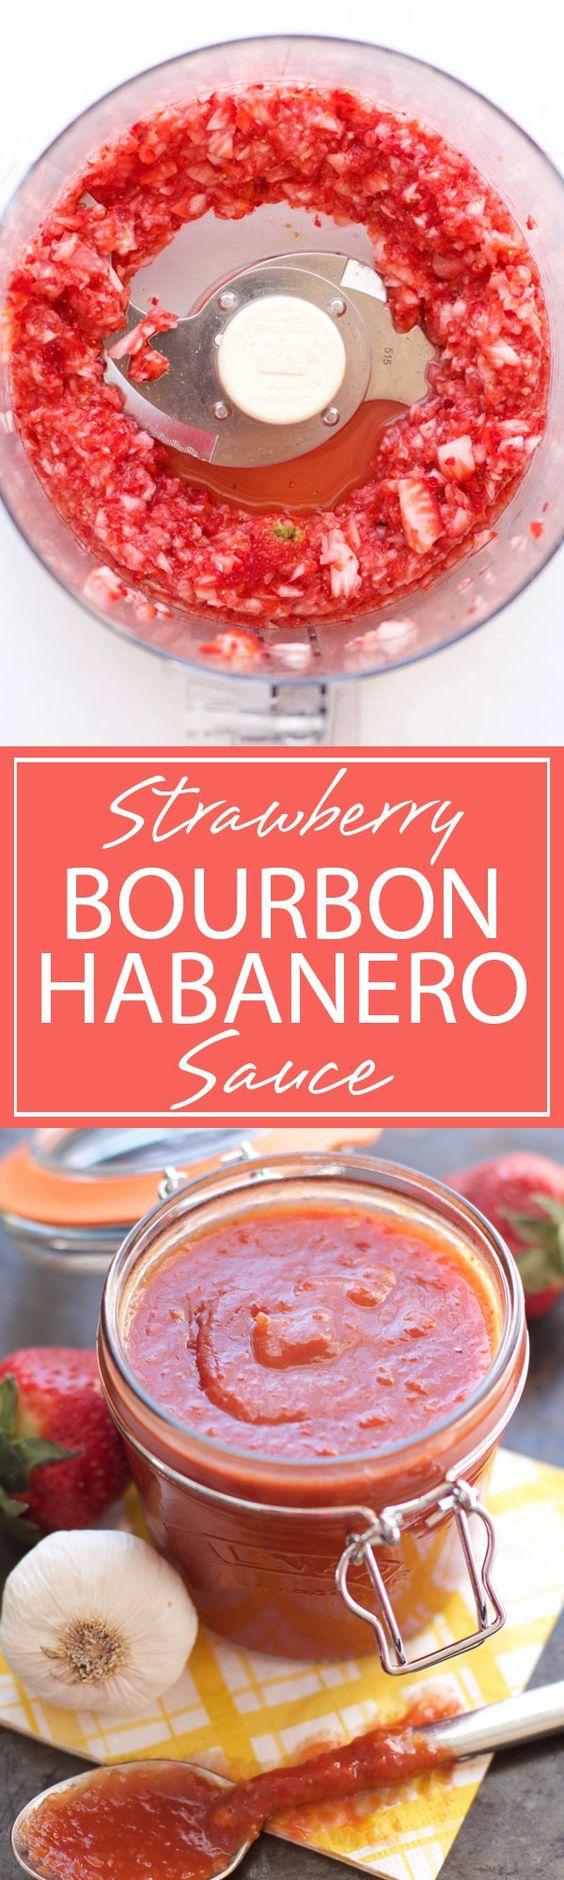 bourbon habanero and more bbq sauces bourbon strawberries sauces ...